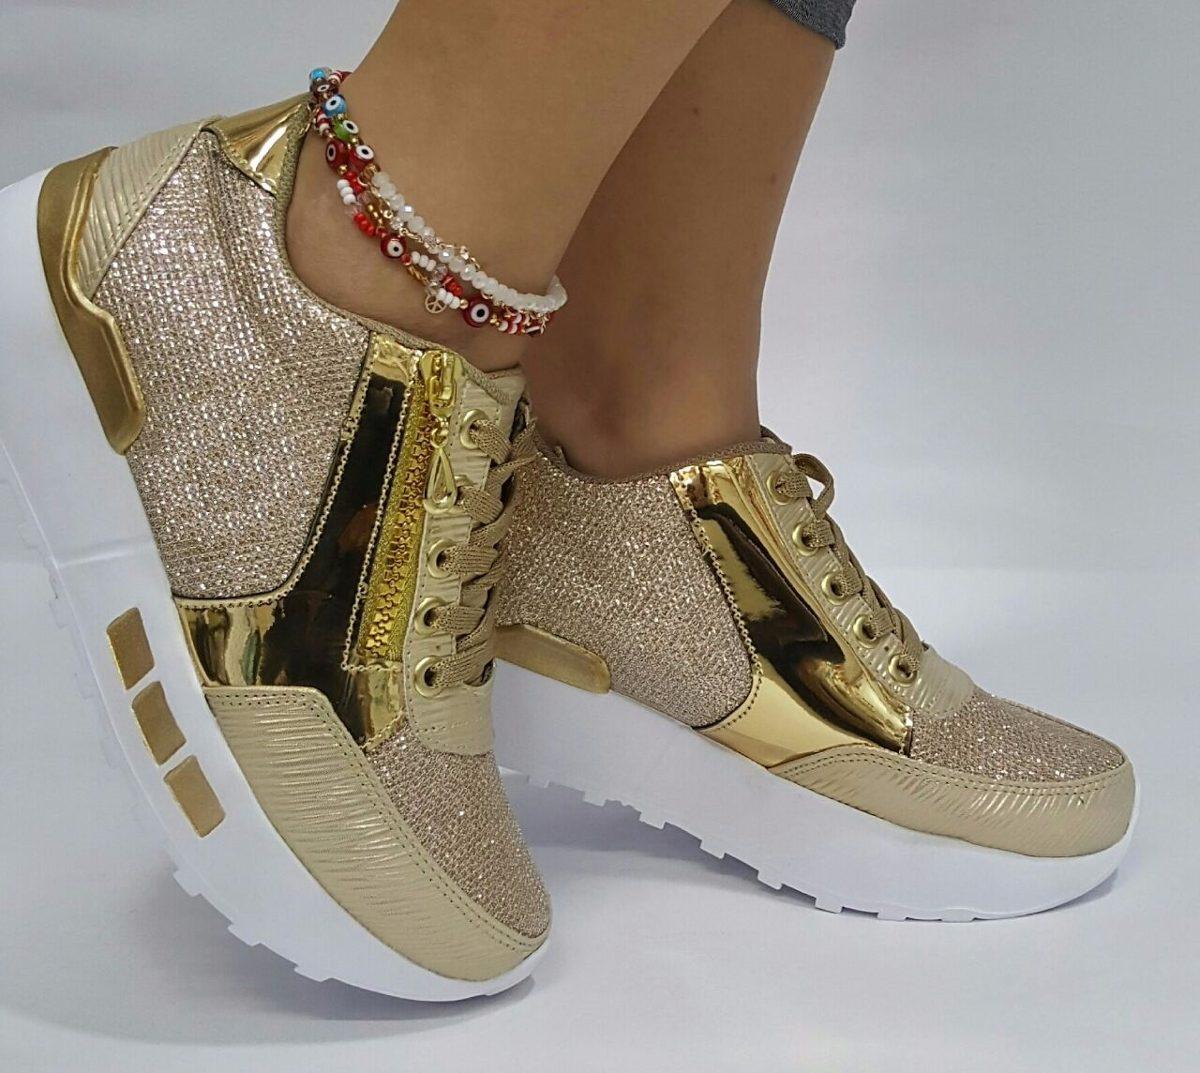 Plano Dorado 690 Dama Envío Gratis 71 Calzado Zapato Mujer Moda RqxwEdzg4